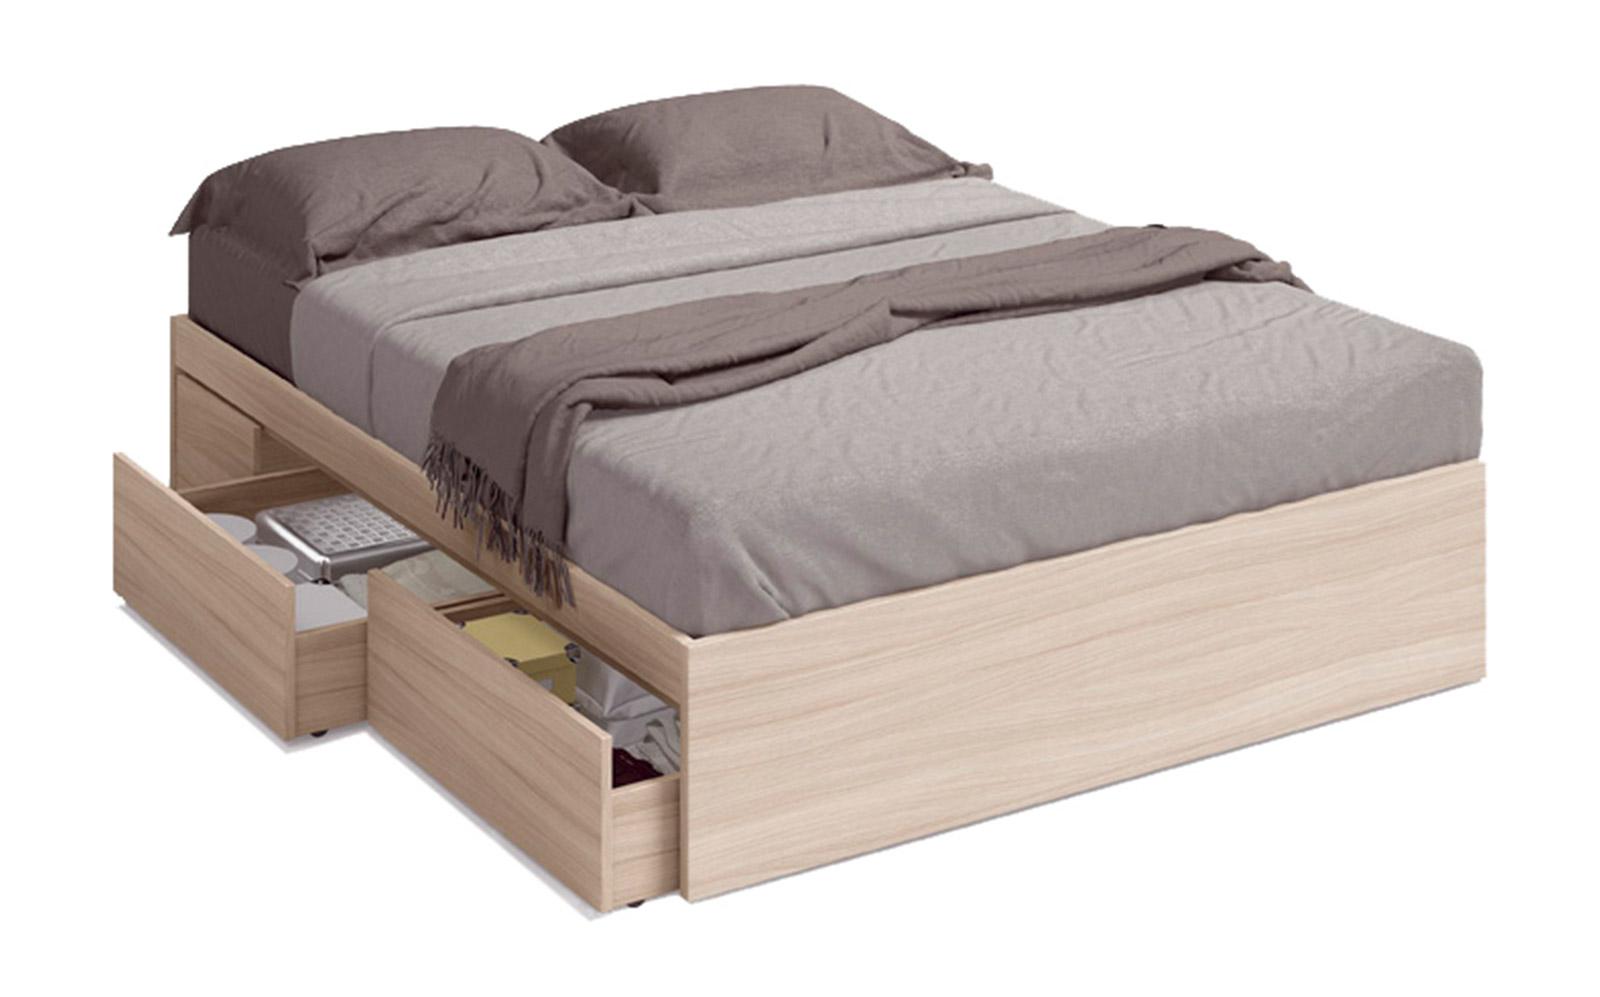 HomeLoft base cama con cojones